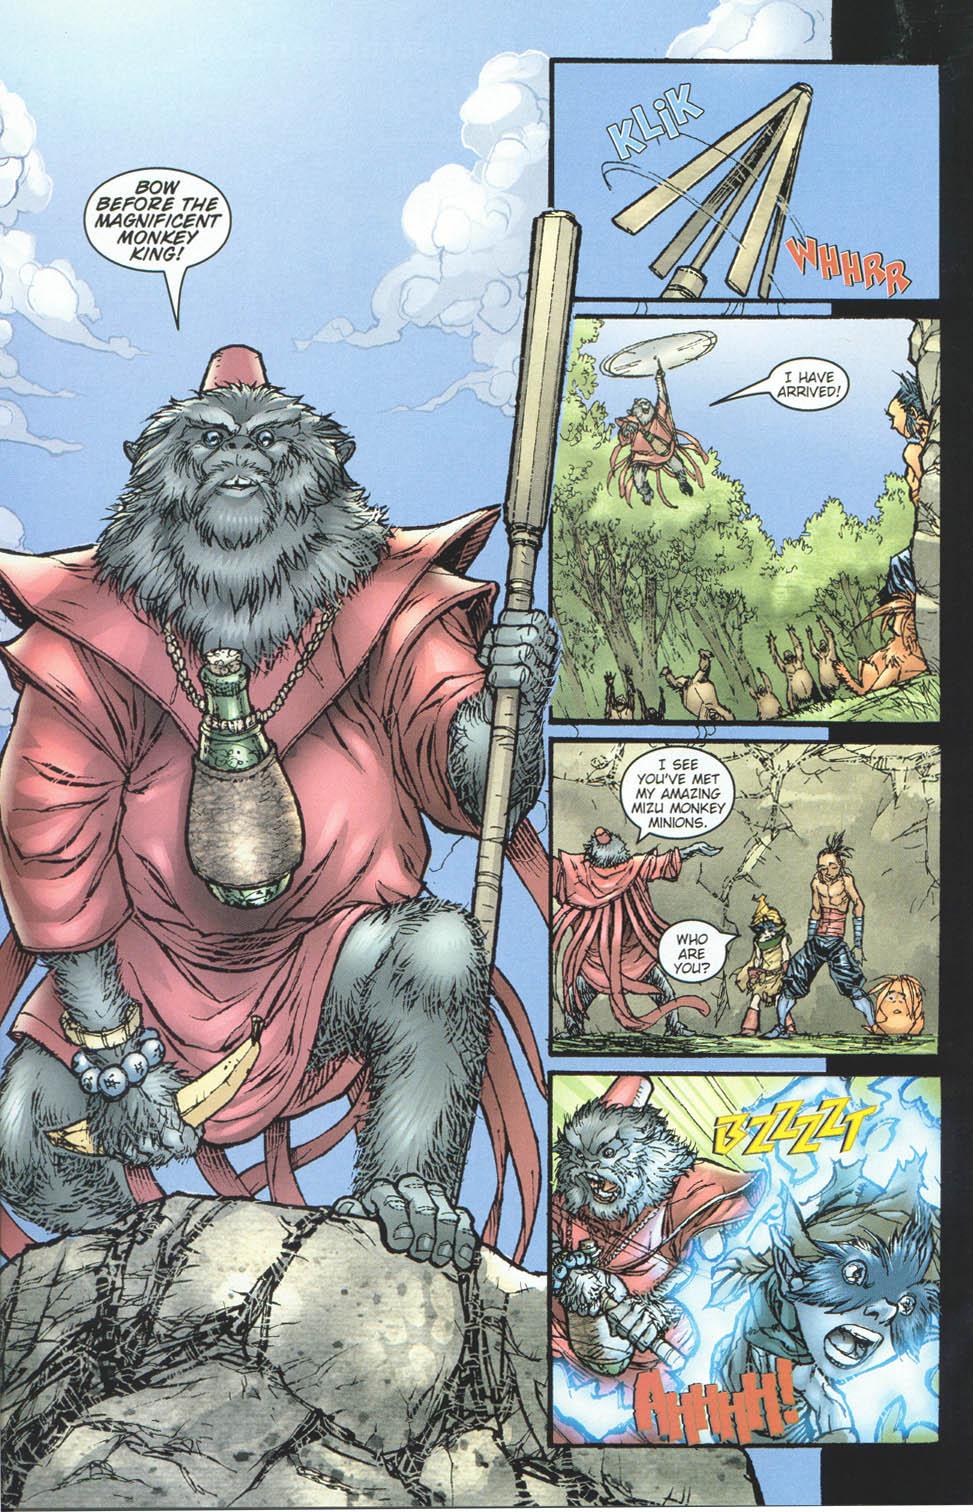 Read online Ninja Boy comic -  Issue #5 - 19